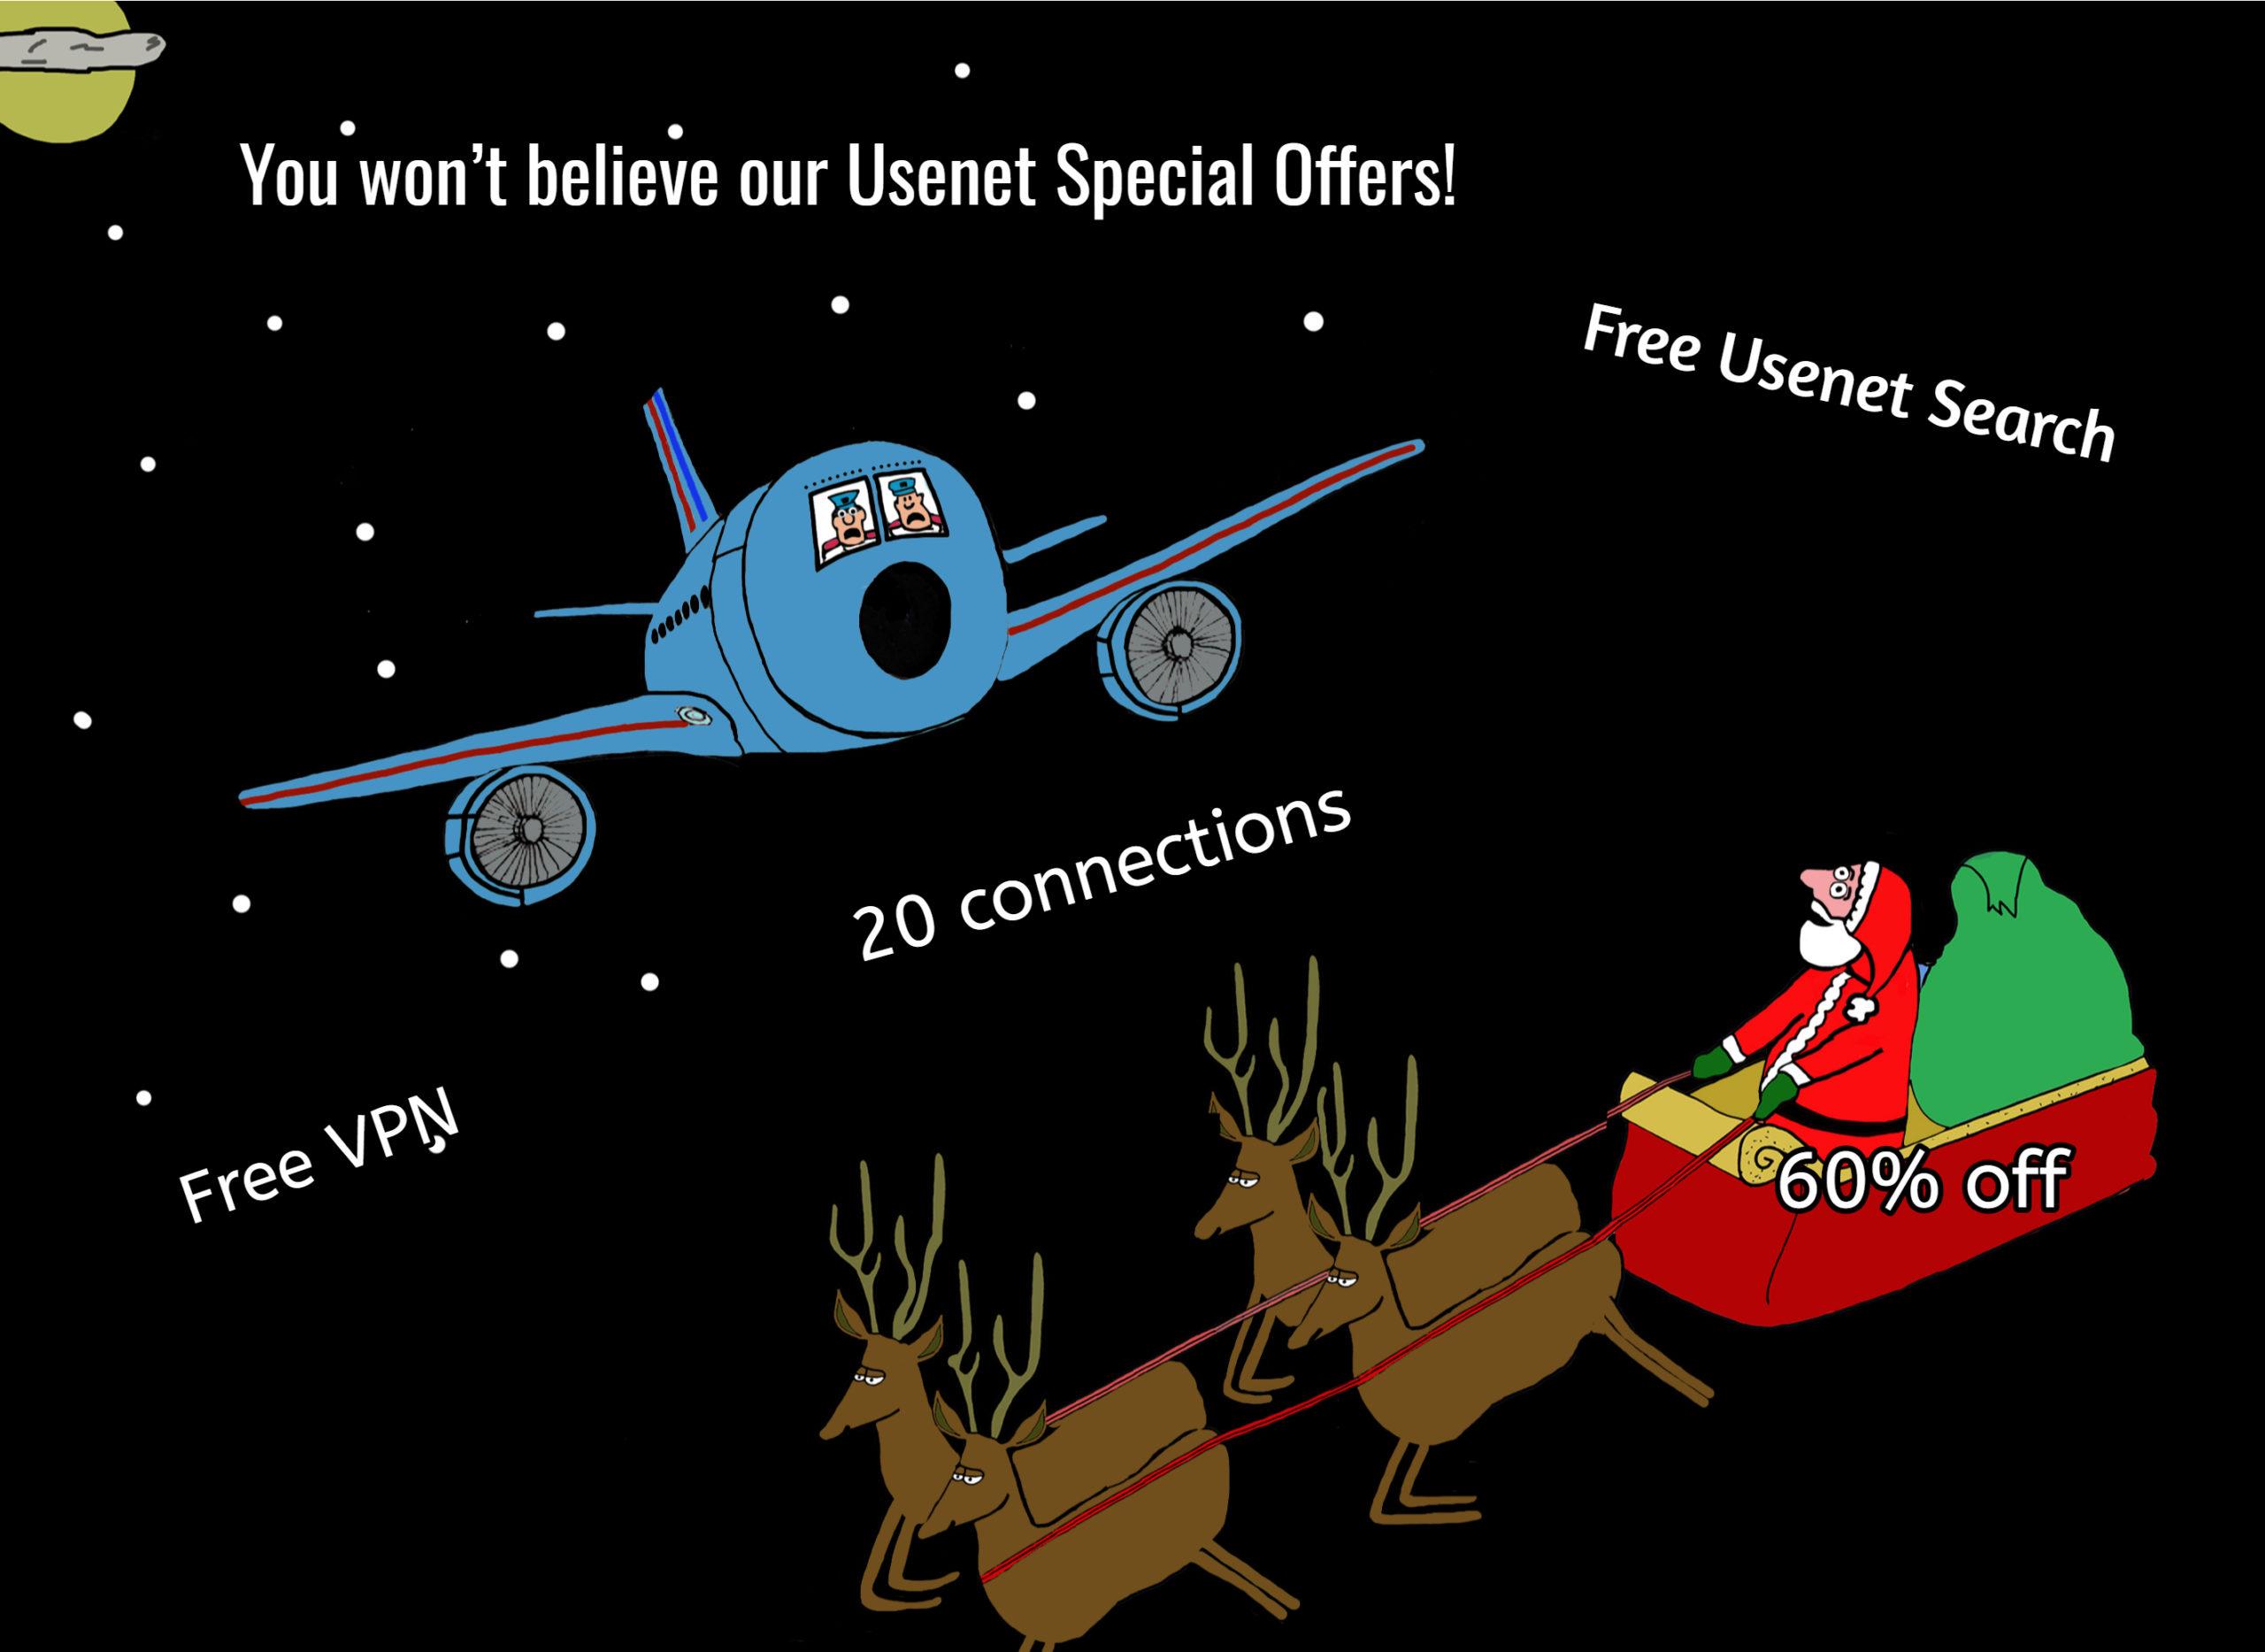 2018 Usenet Holiday Promotions